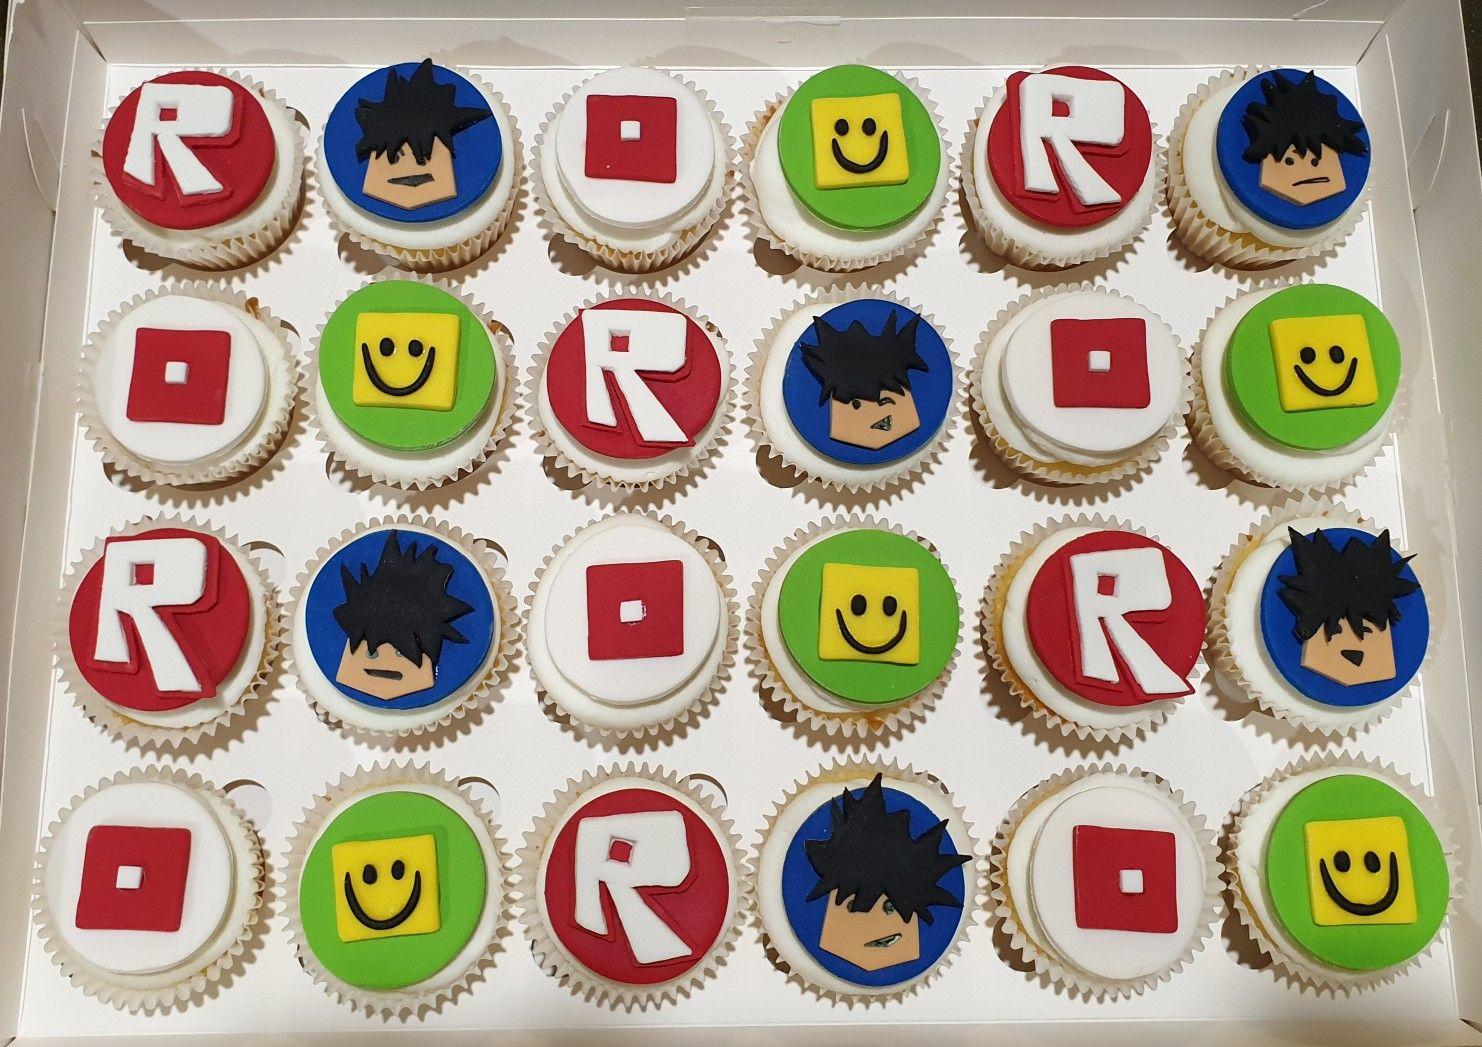 Roblox Birthday Cupcakes Sebastian S 7th Birthday Roblox Cupcakes Cupcake Birthday Cake Cupcakes Decoration Birthday Cupcakes